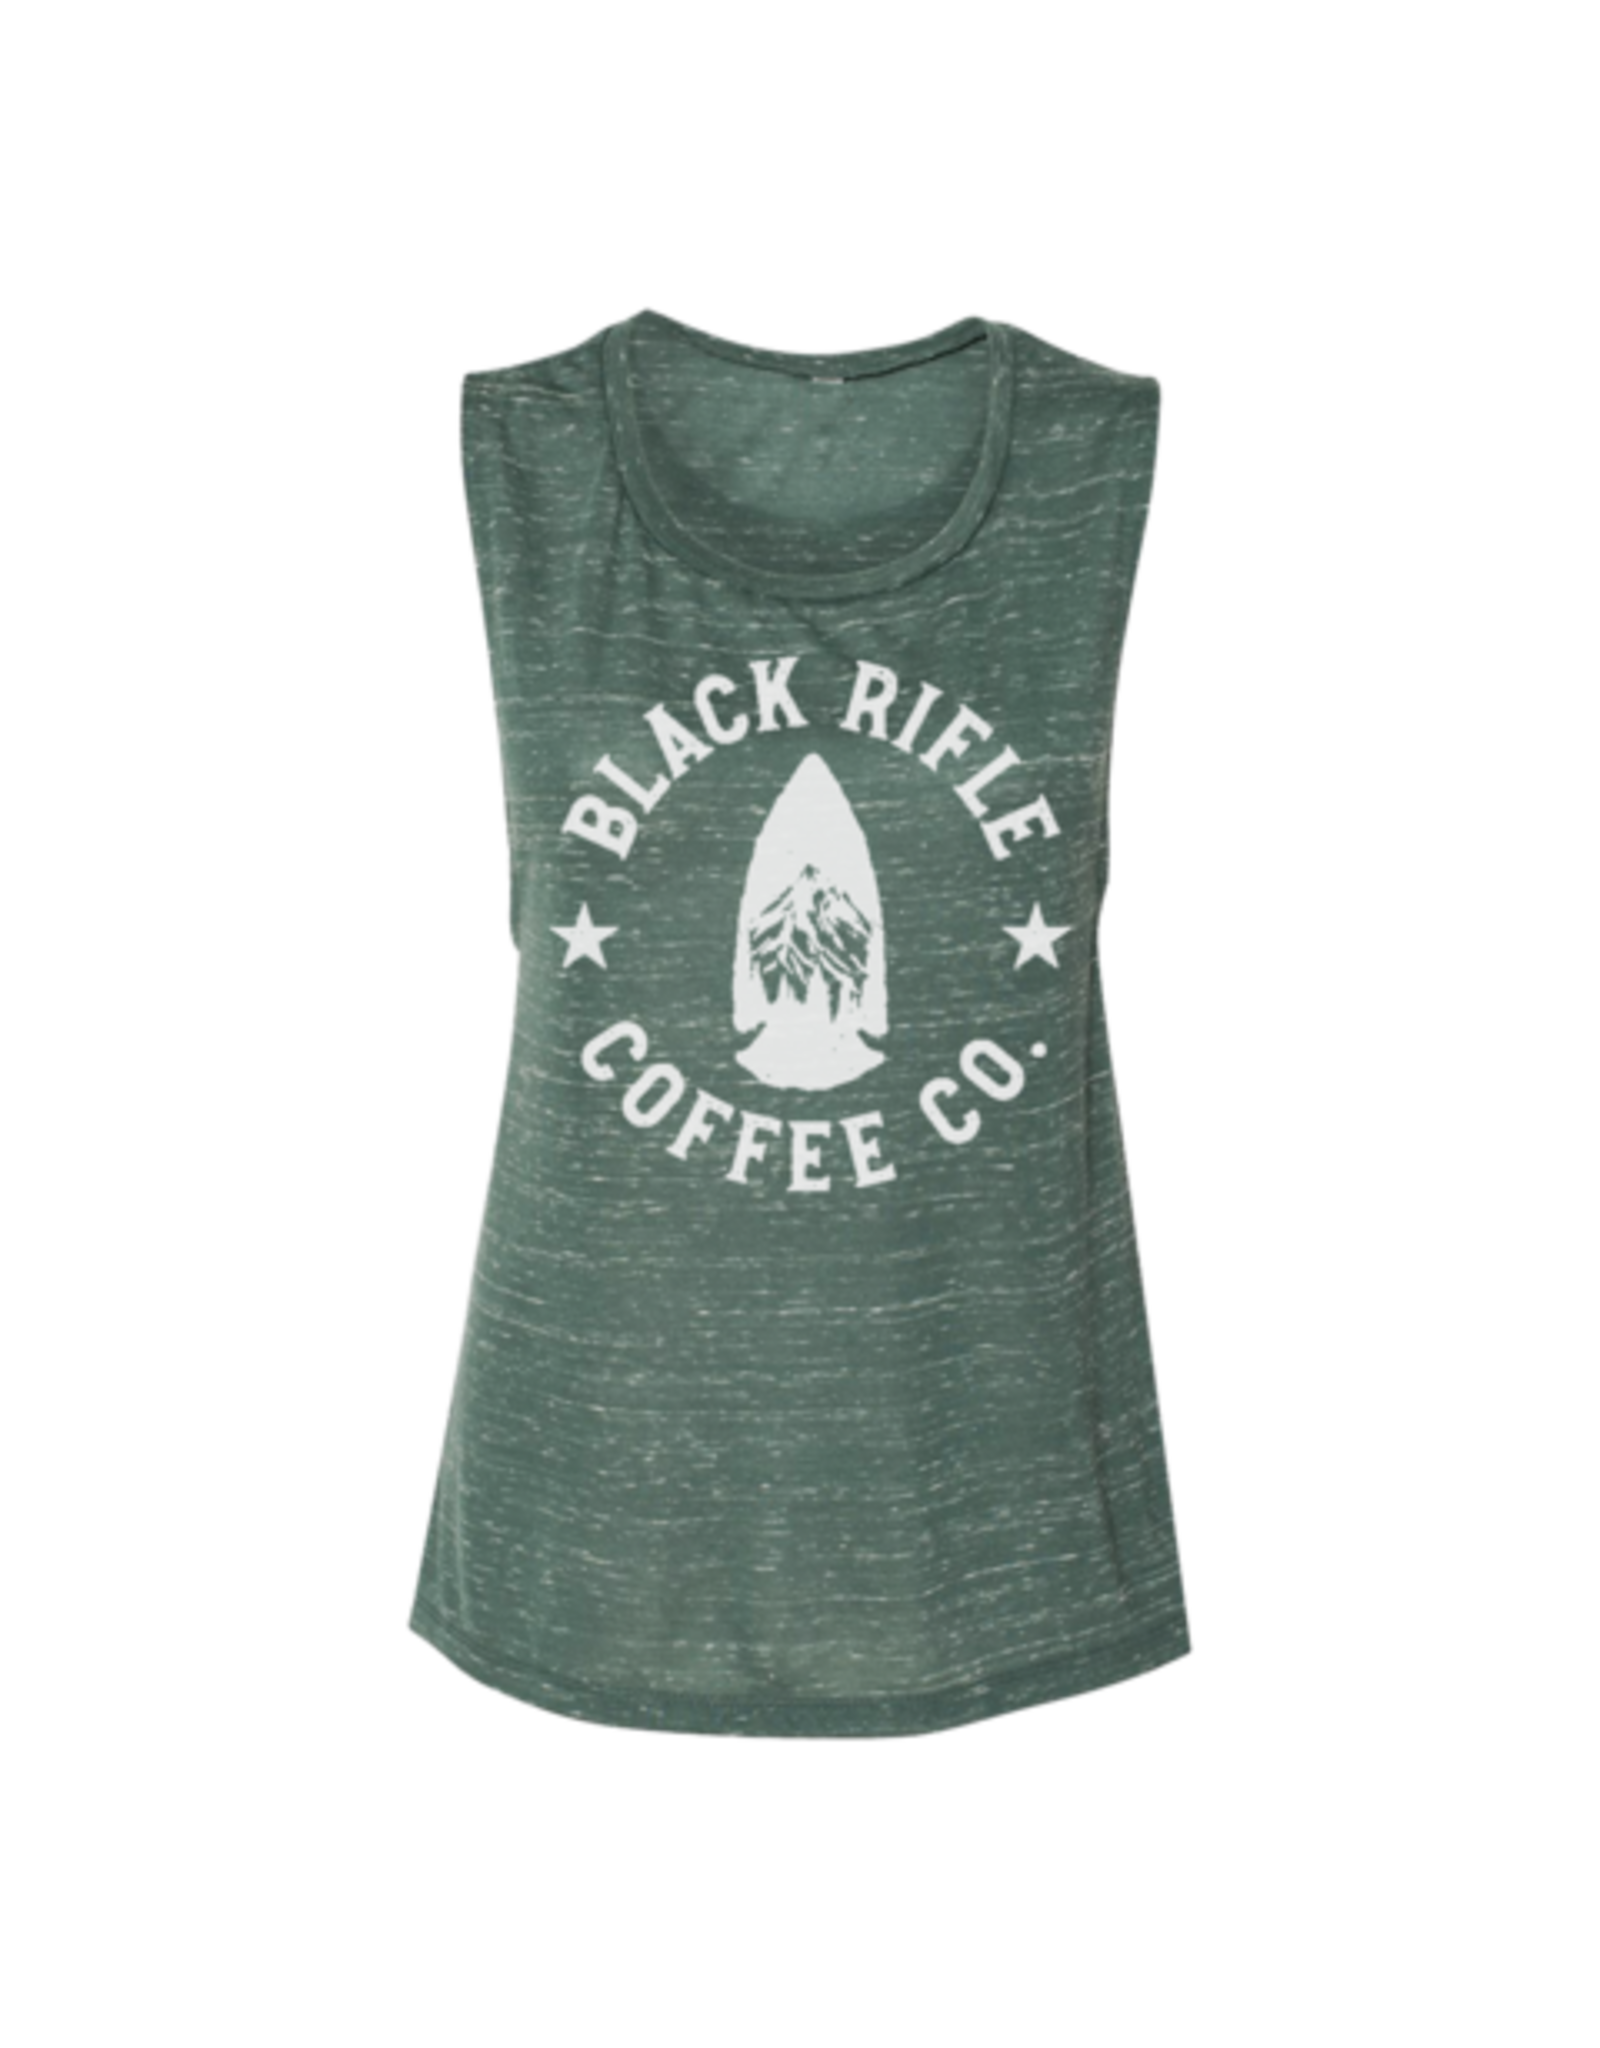 Black Rifle Coffee Arrowhead Muscle Tank Top